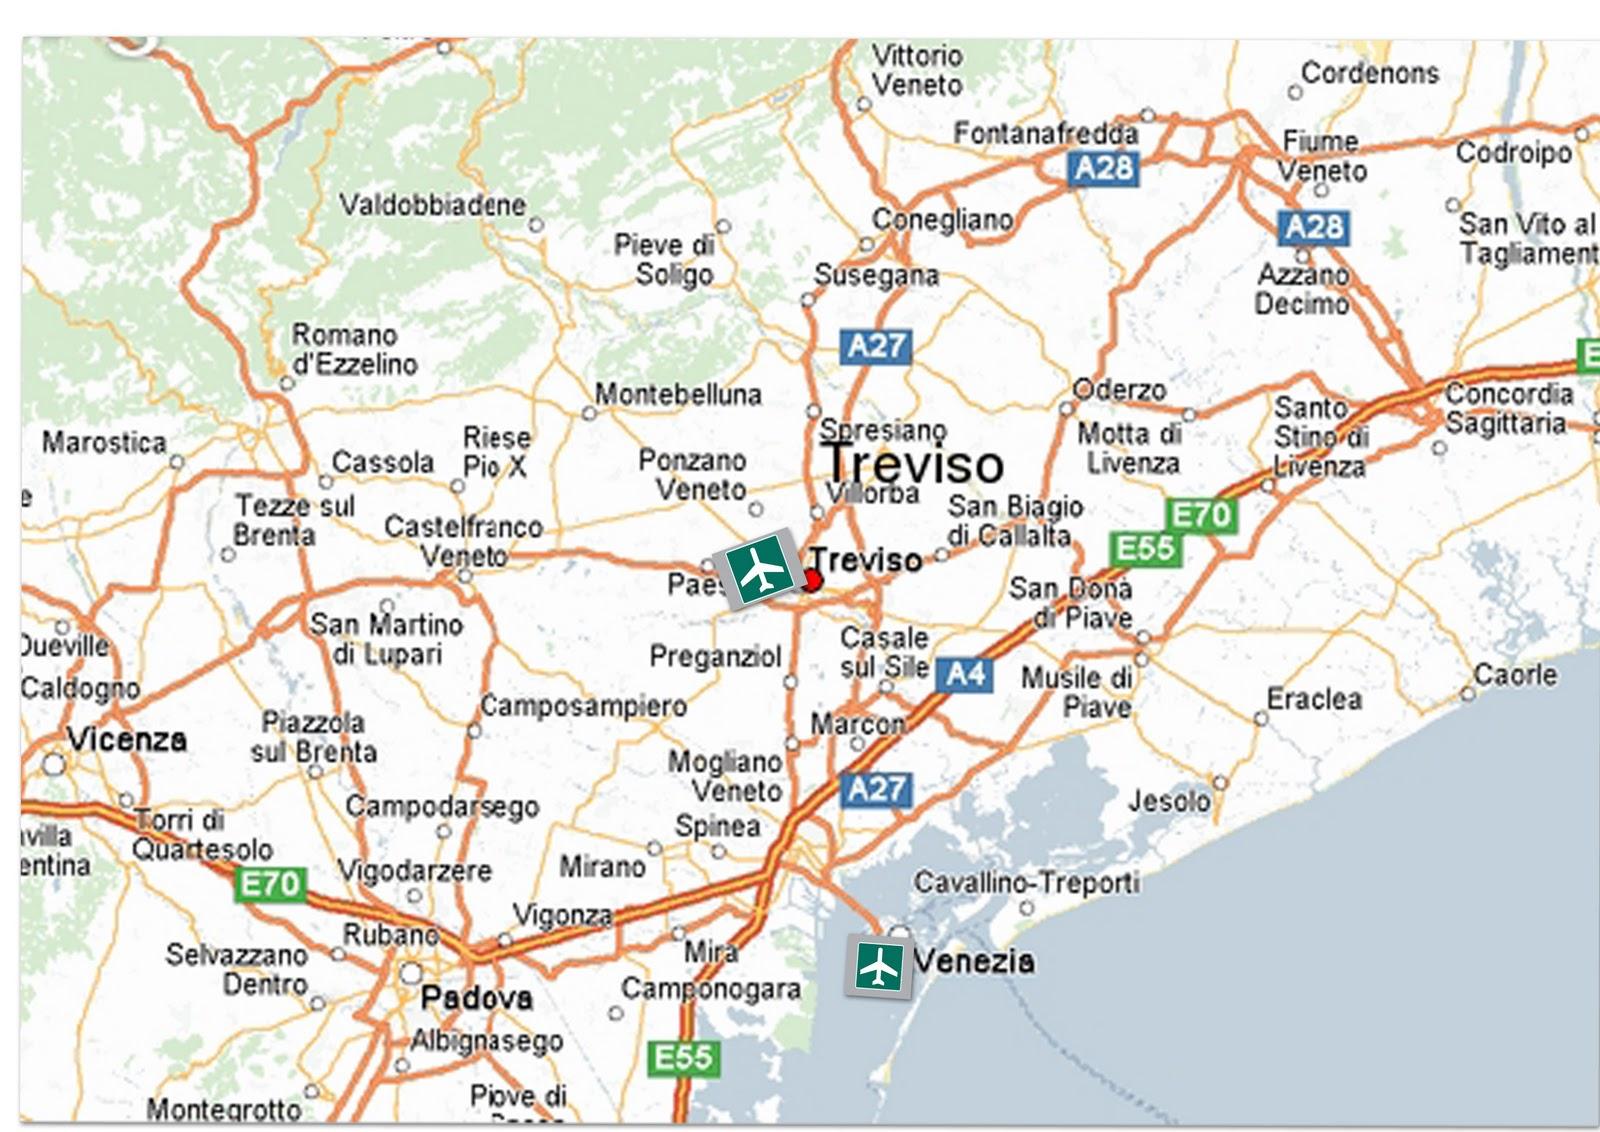 Airports of Venice: Treviso, Venice. Marco Polo and Venice-Lido 100